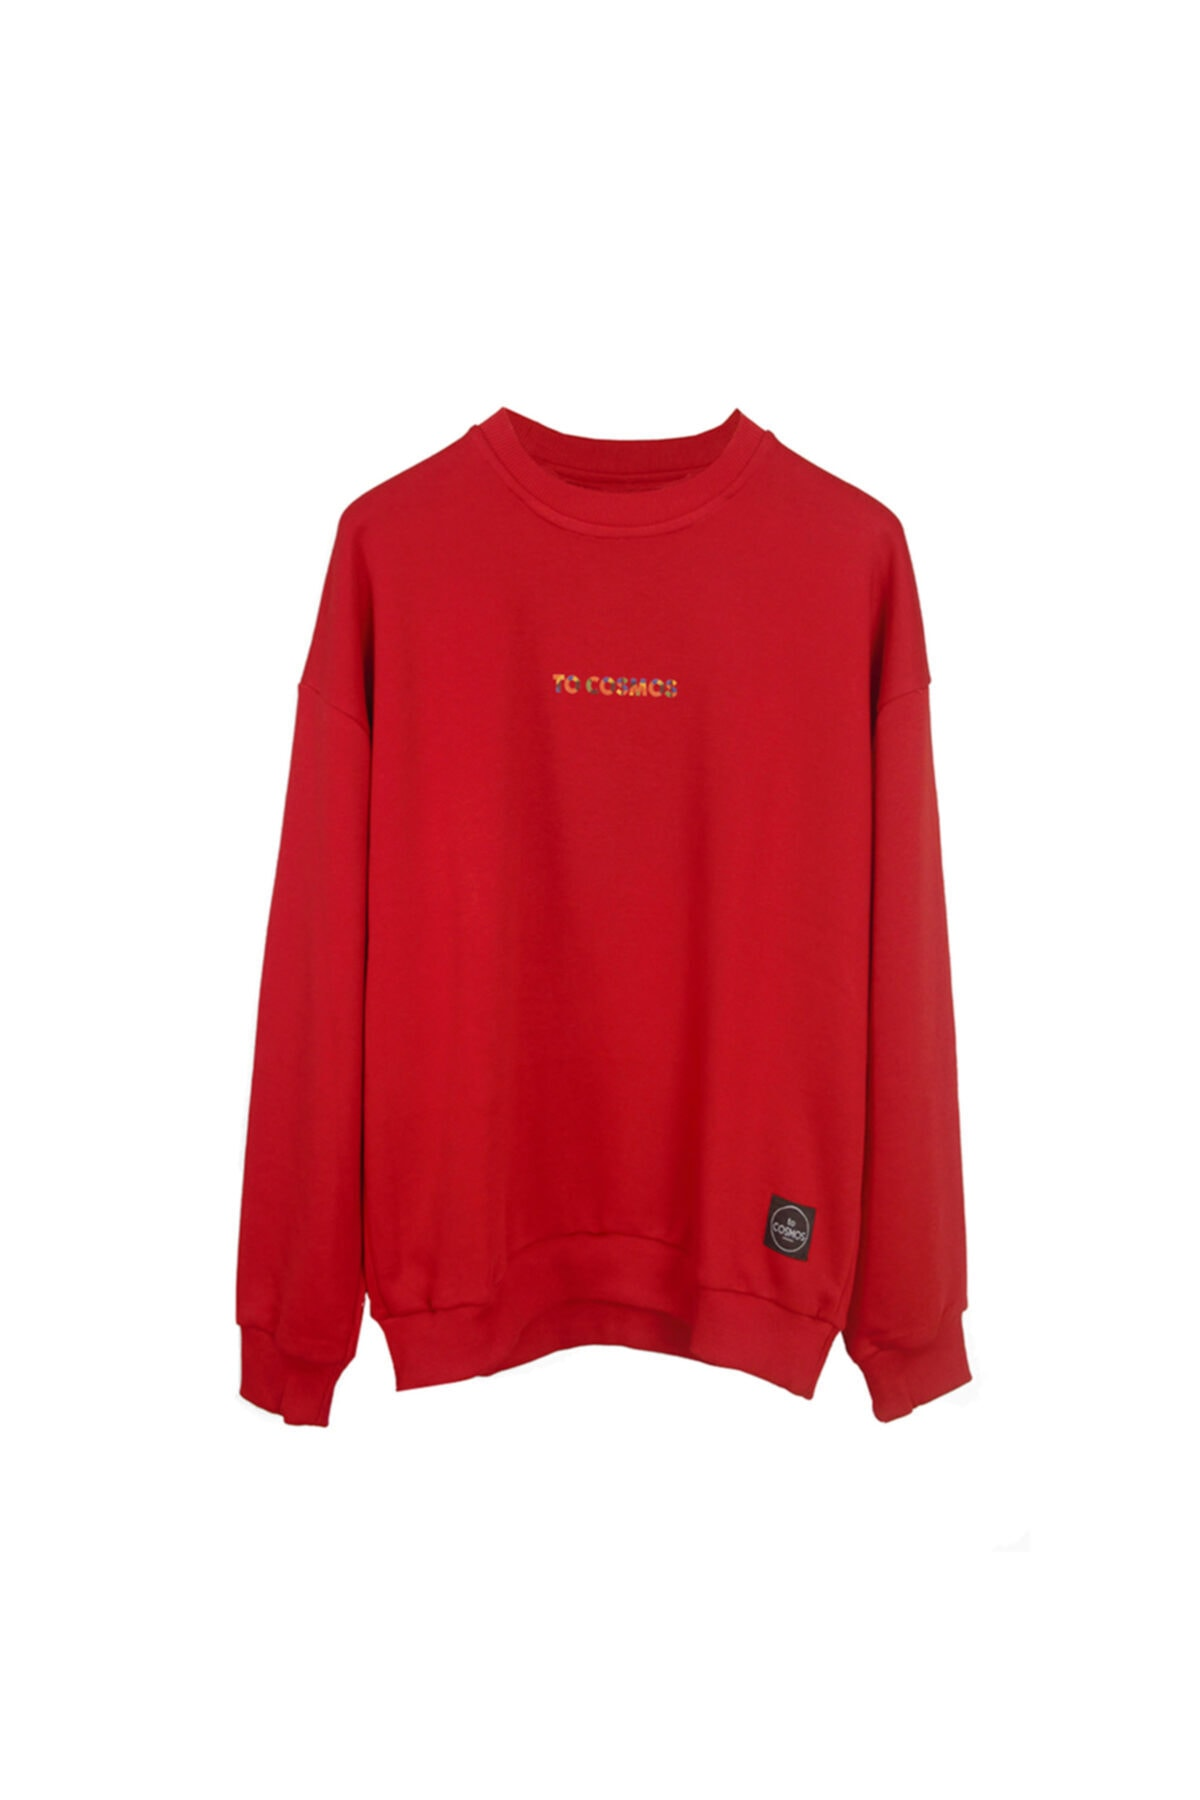 to COSMOS Oversıze Sweatshırt Unısex Renk Kırmızı Cosmos 1